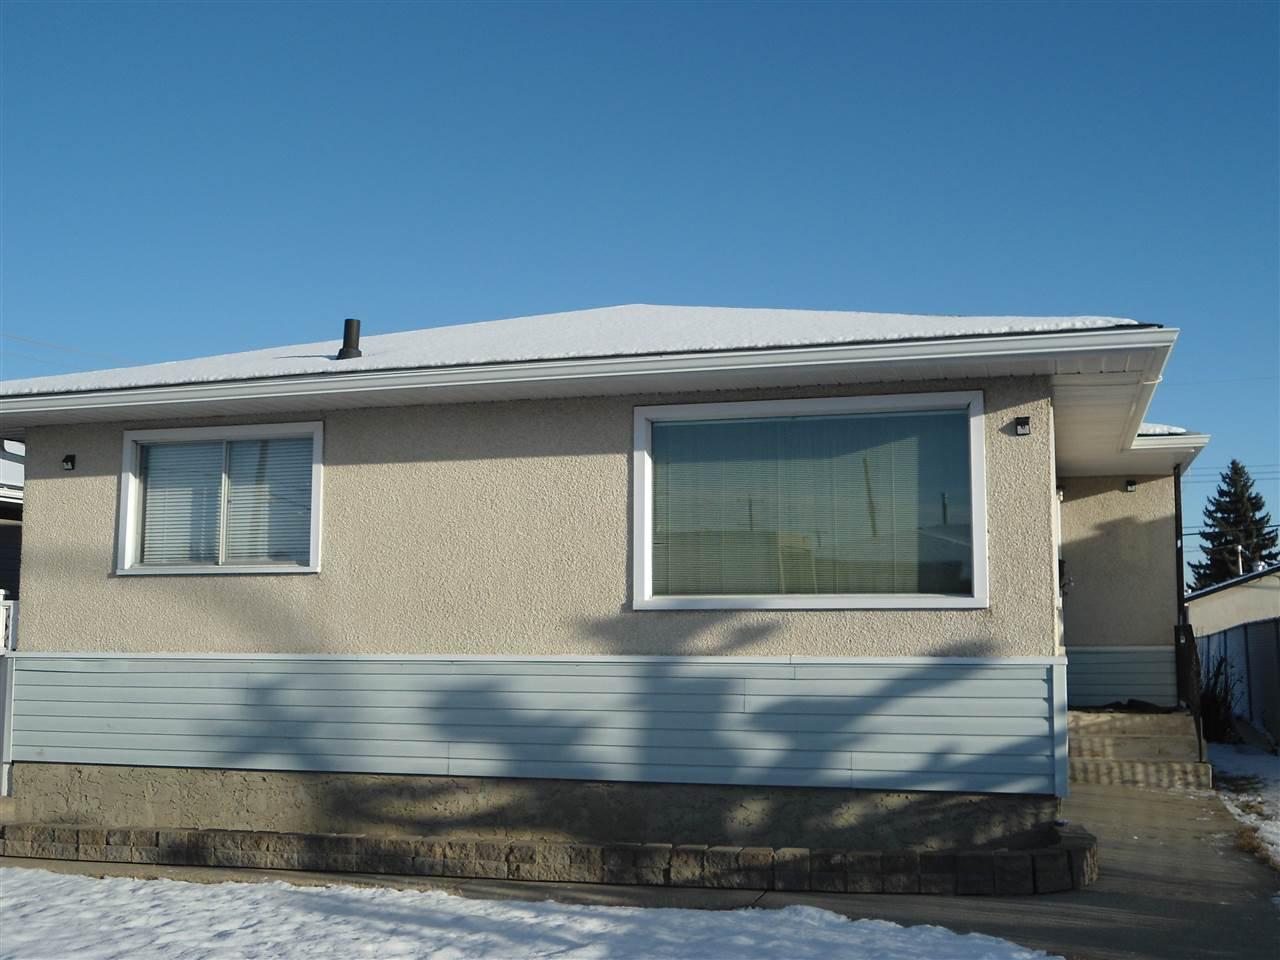 Main Photo: 13607 70 Street in Edmonton: Zone 02 House for sale : MLS®# E4181445